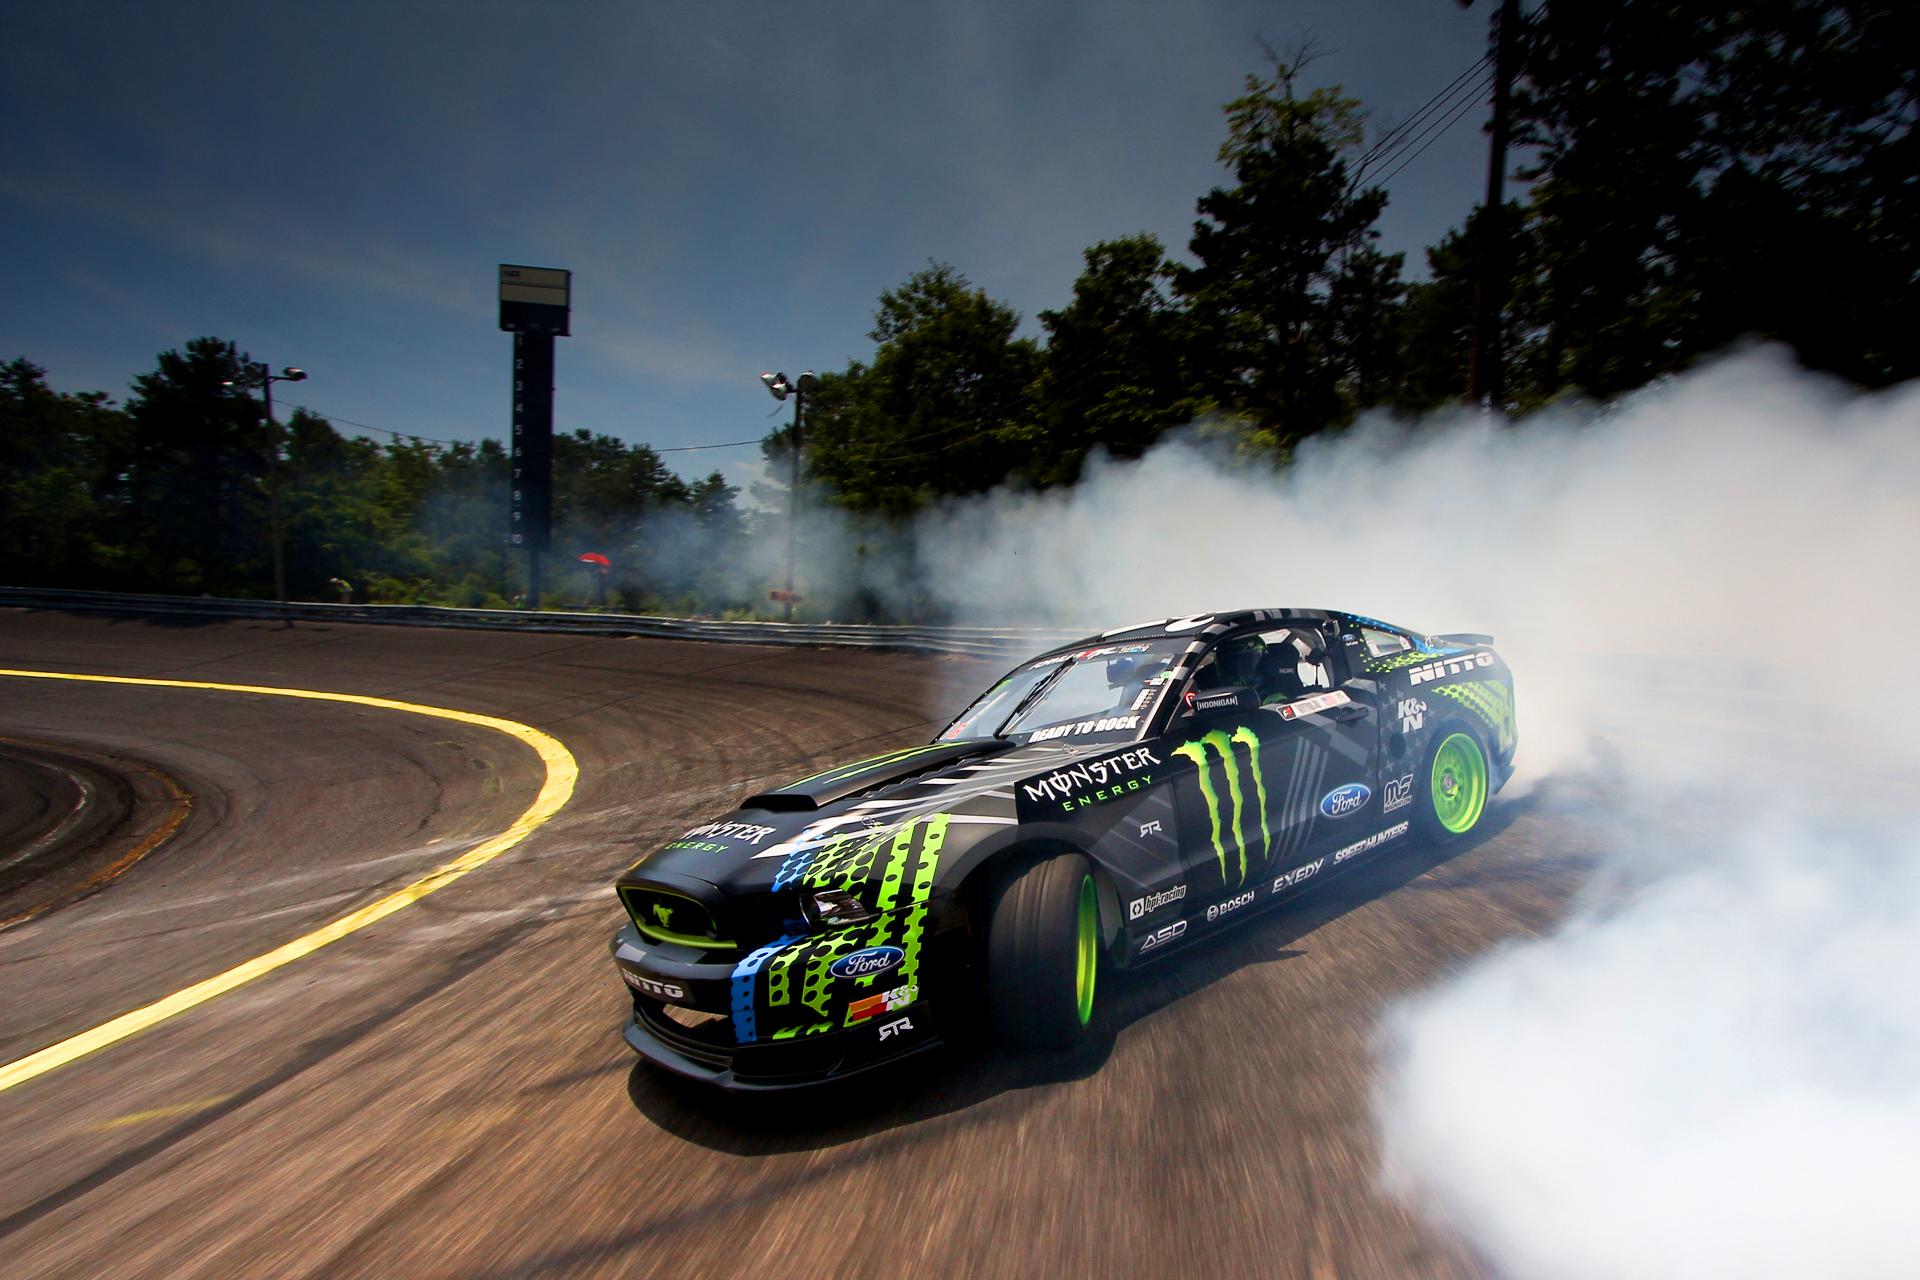 Wallpaper : Race Cars, Smoke, Ford Mustang, Sports Car